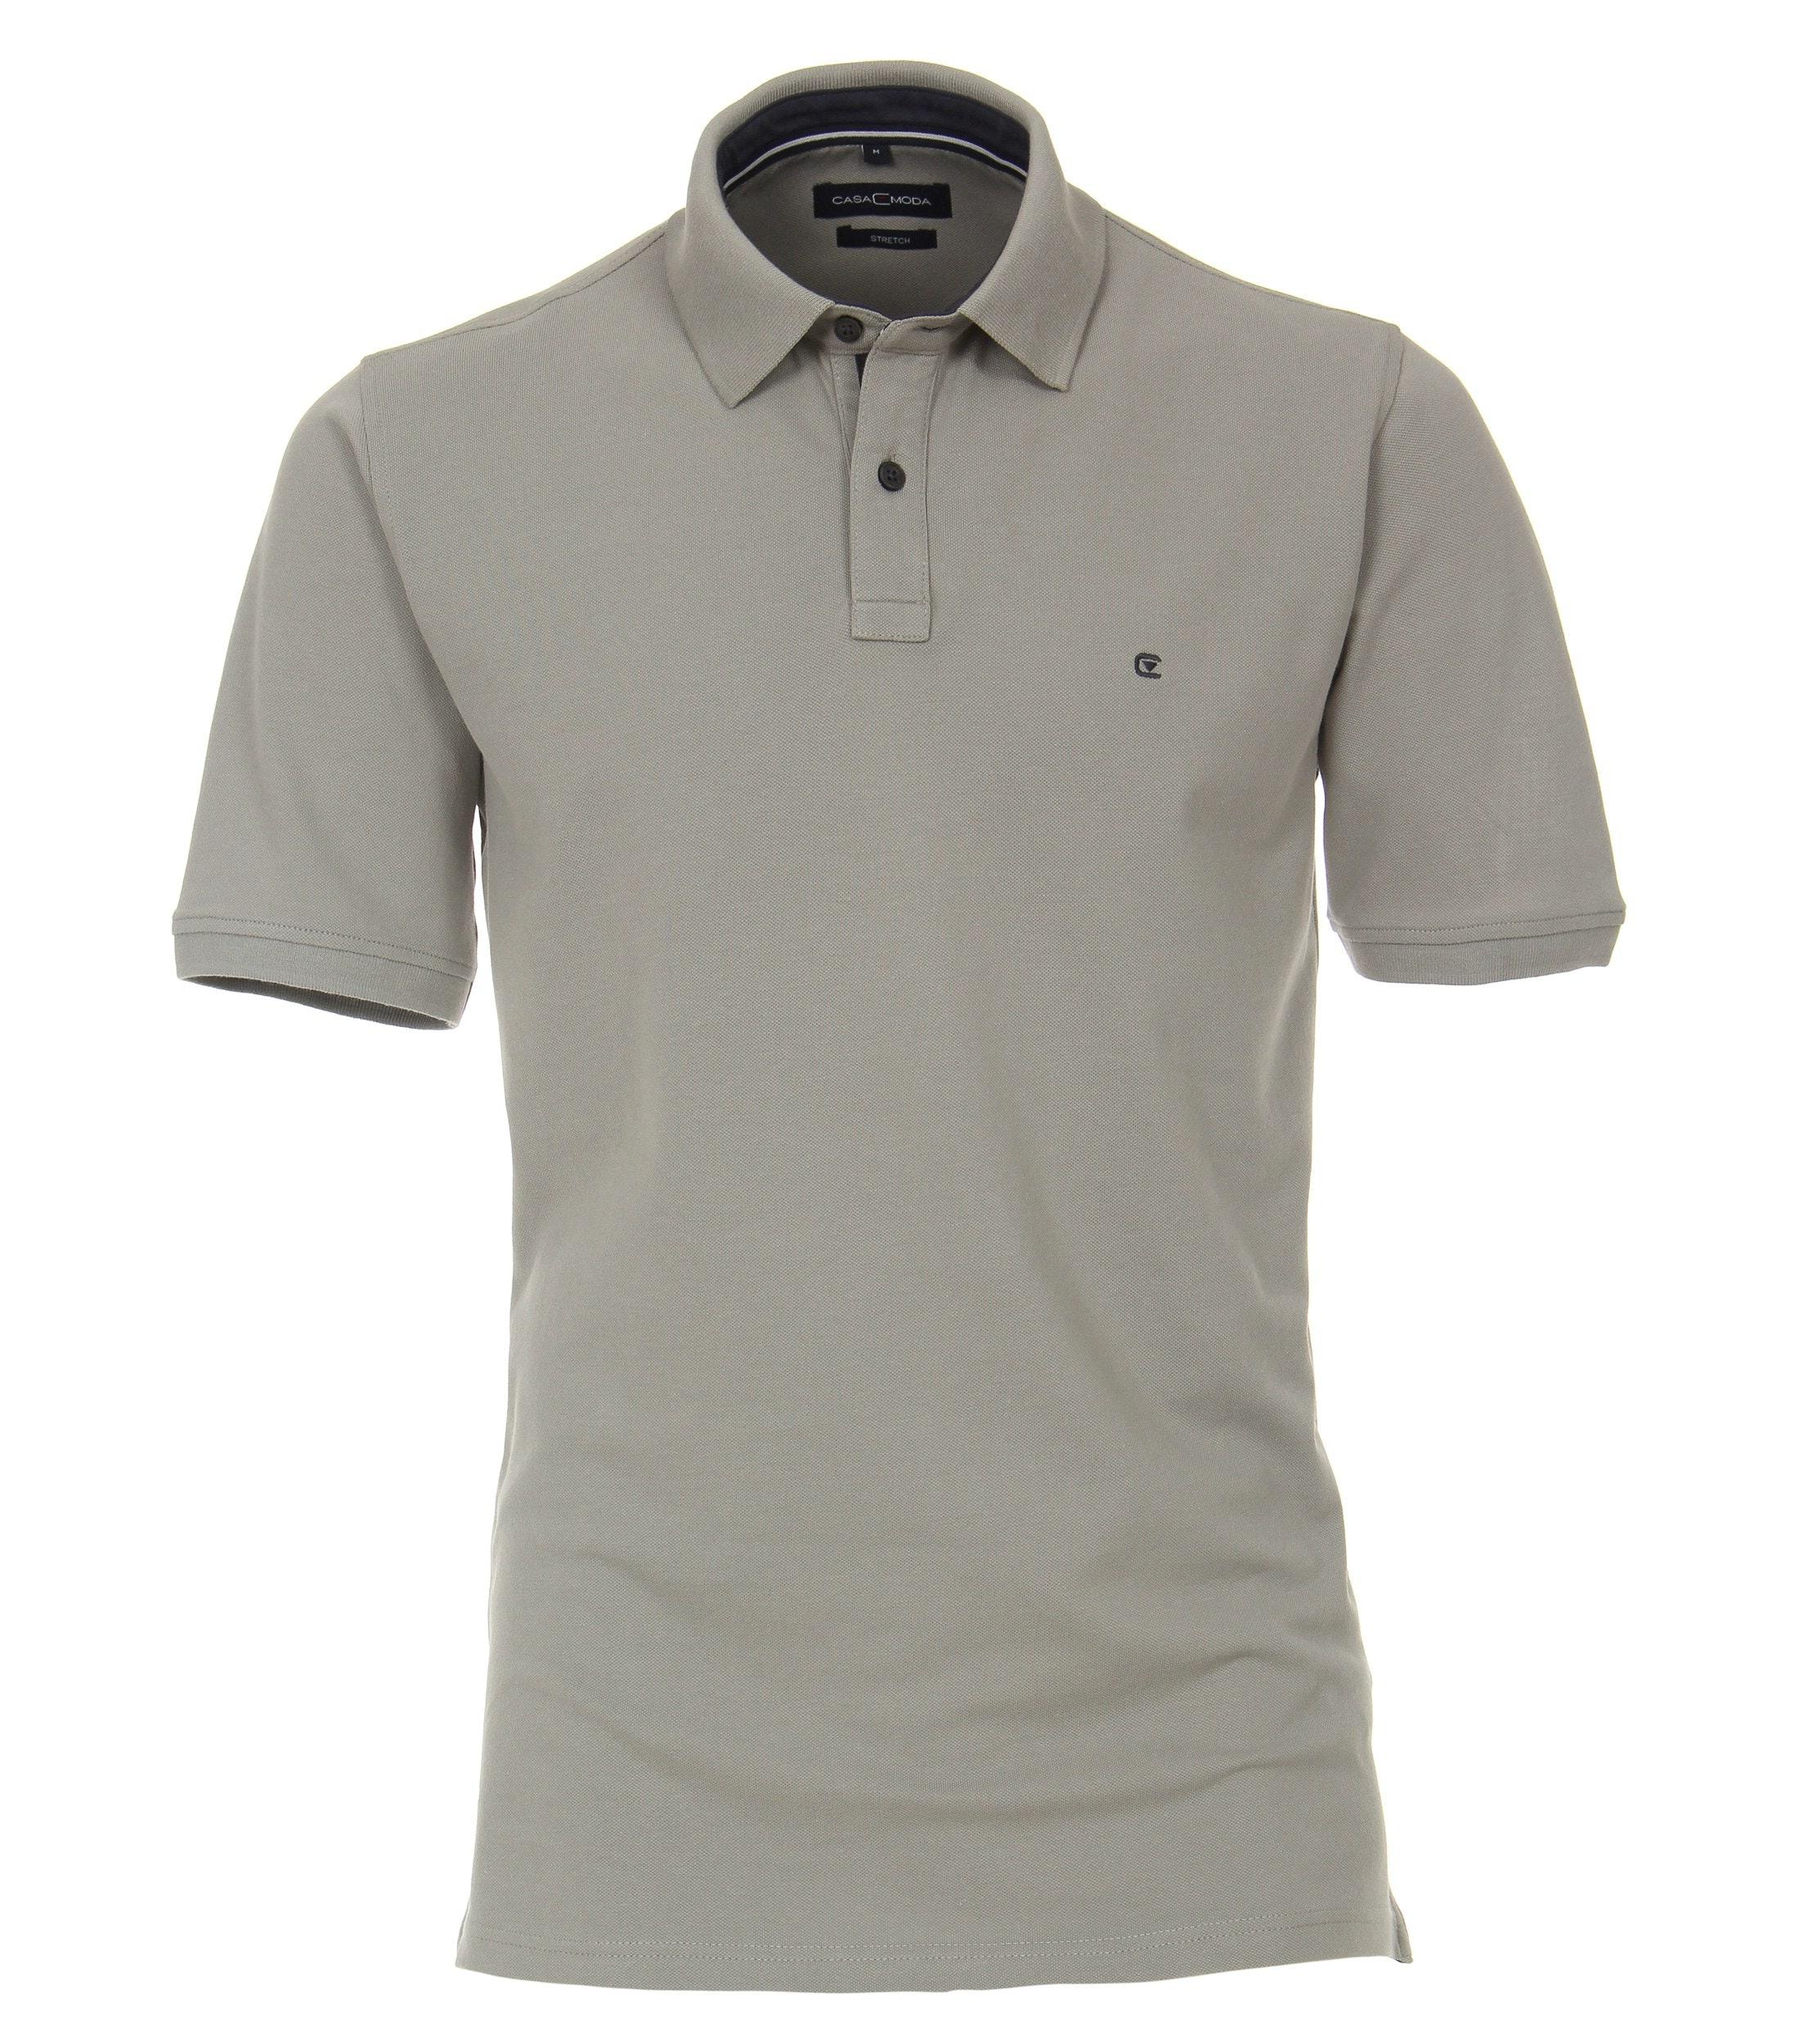 CasaModa Polo-Shirt, grau